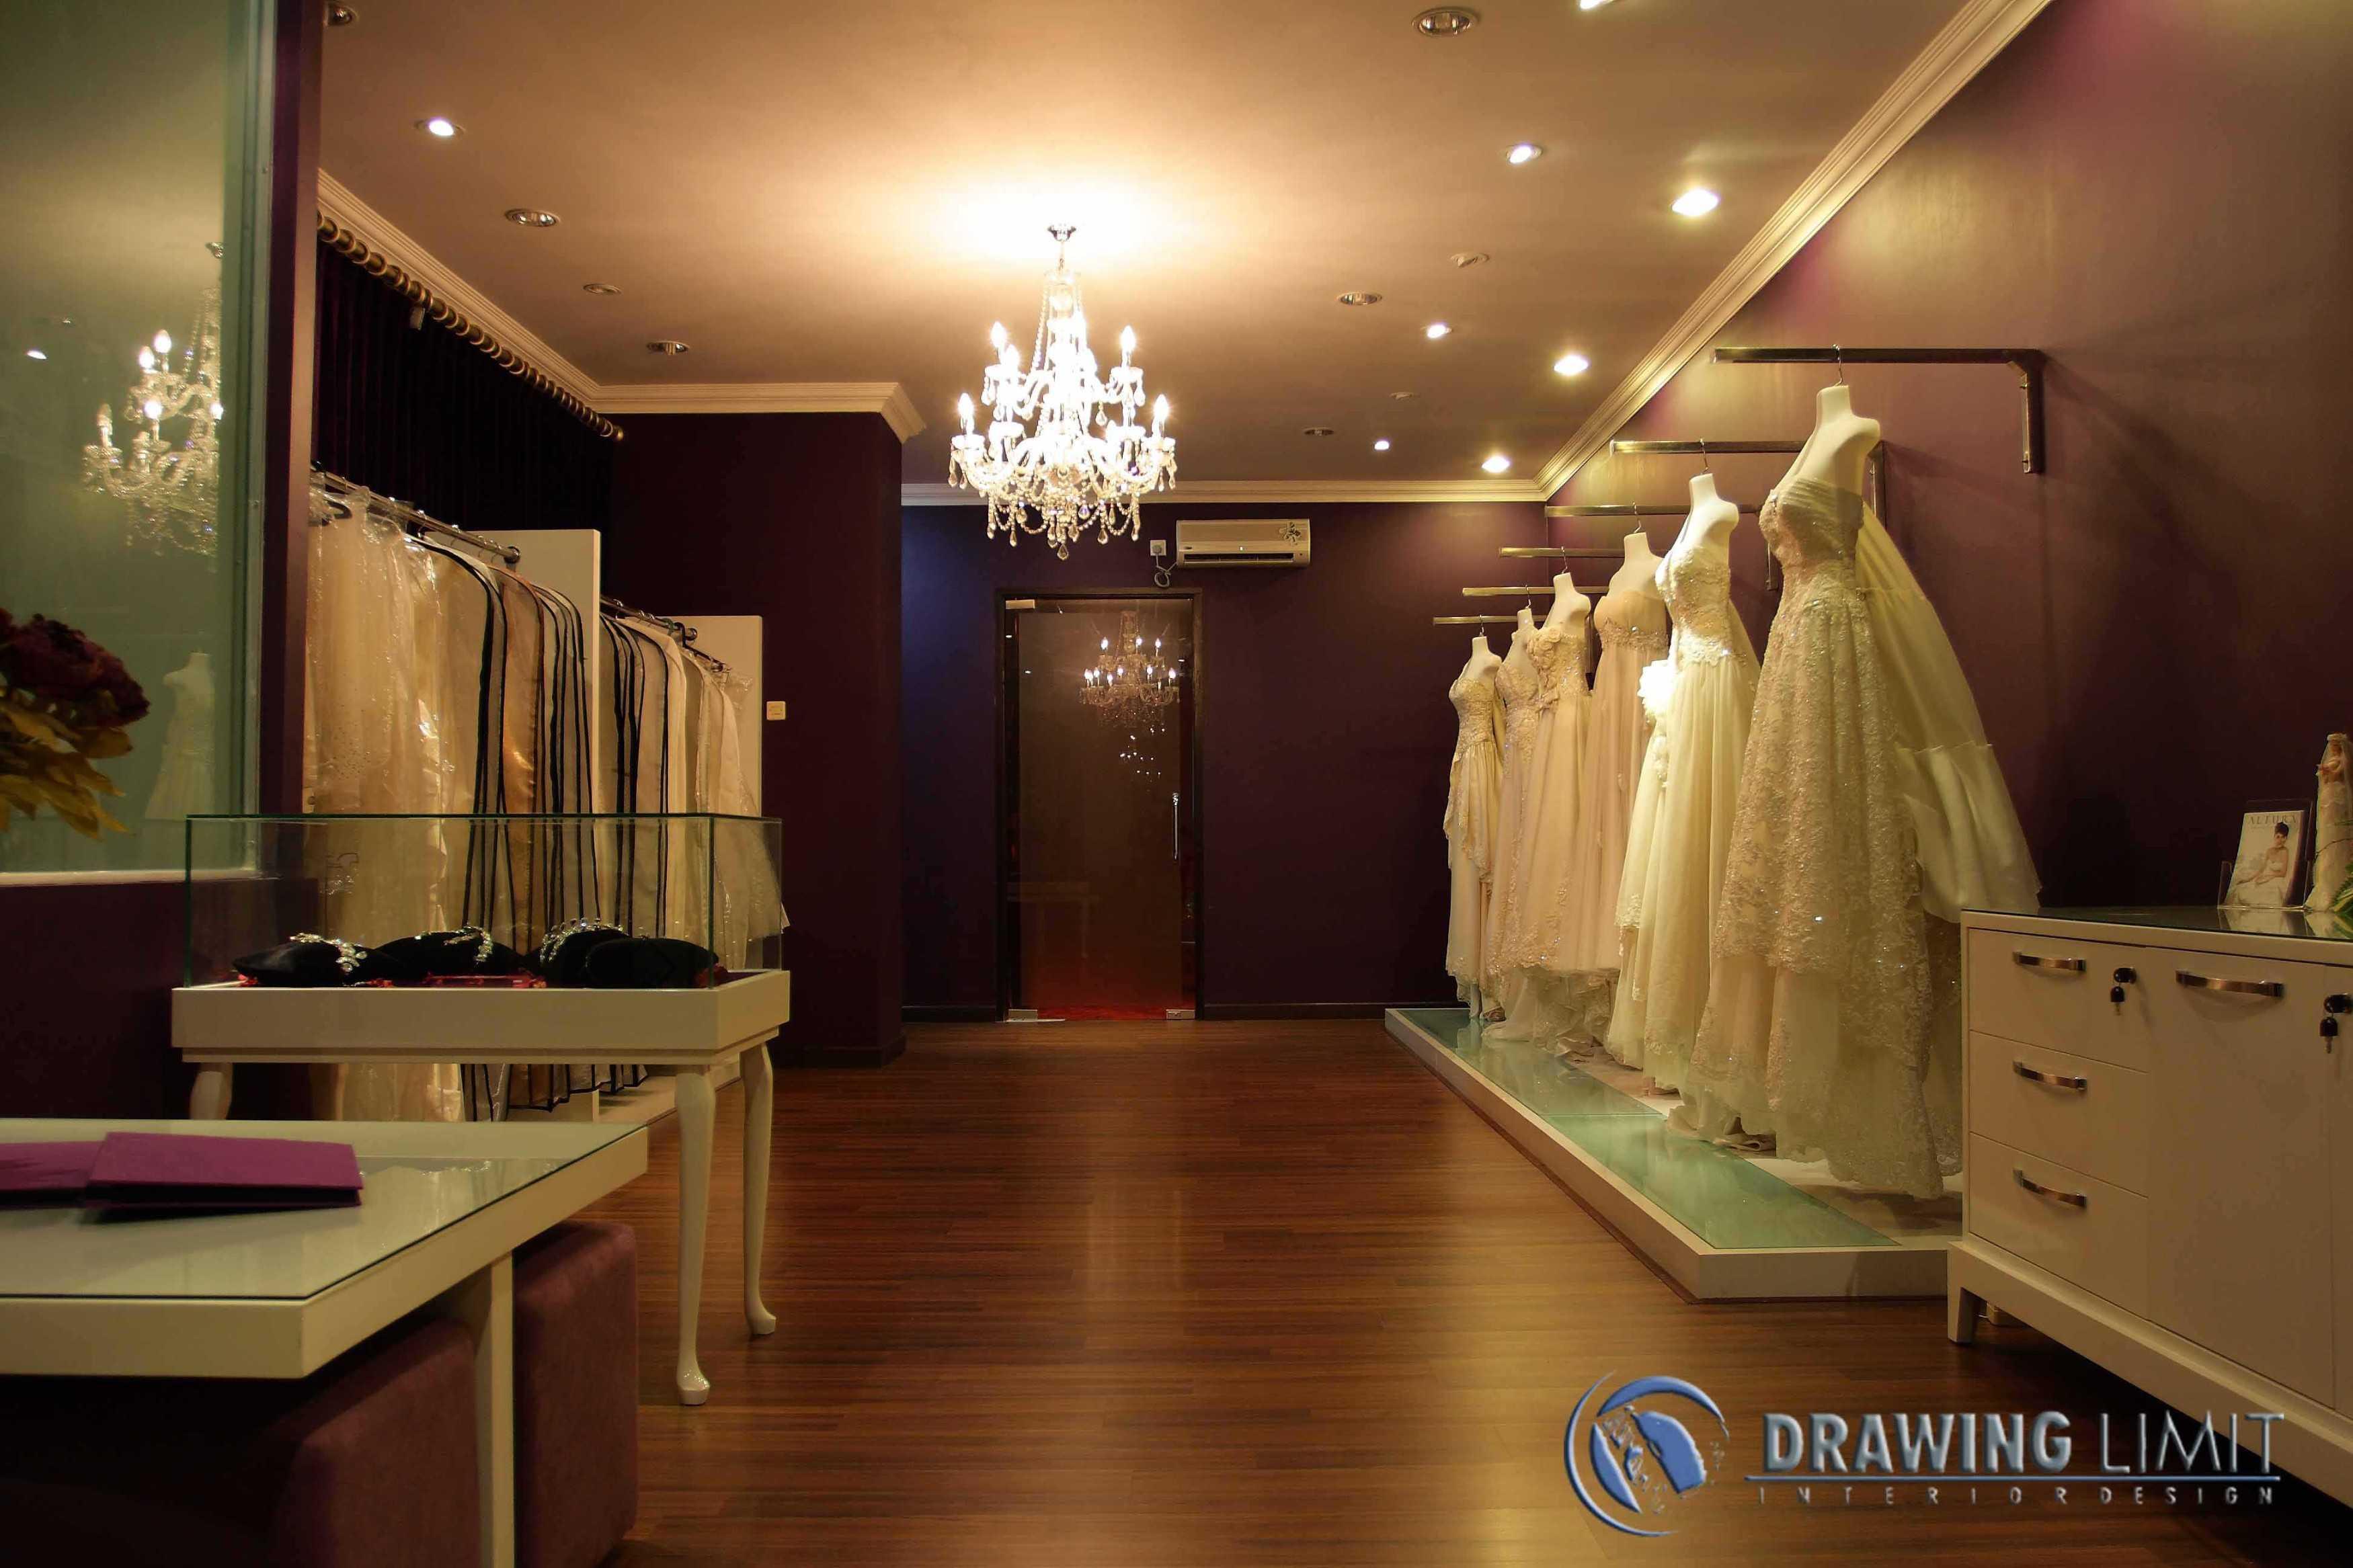 Budi Zhou Bridal Altura Surabaya City, East Java, Indonesia Surabaya City, East Java, Indonesia Salon001 Klasik  32404